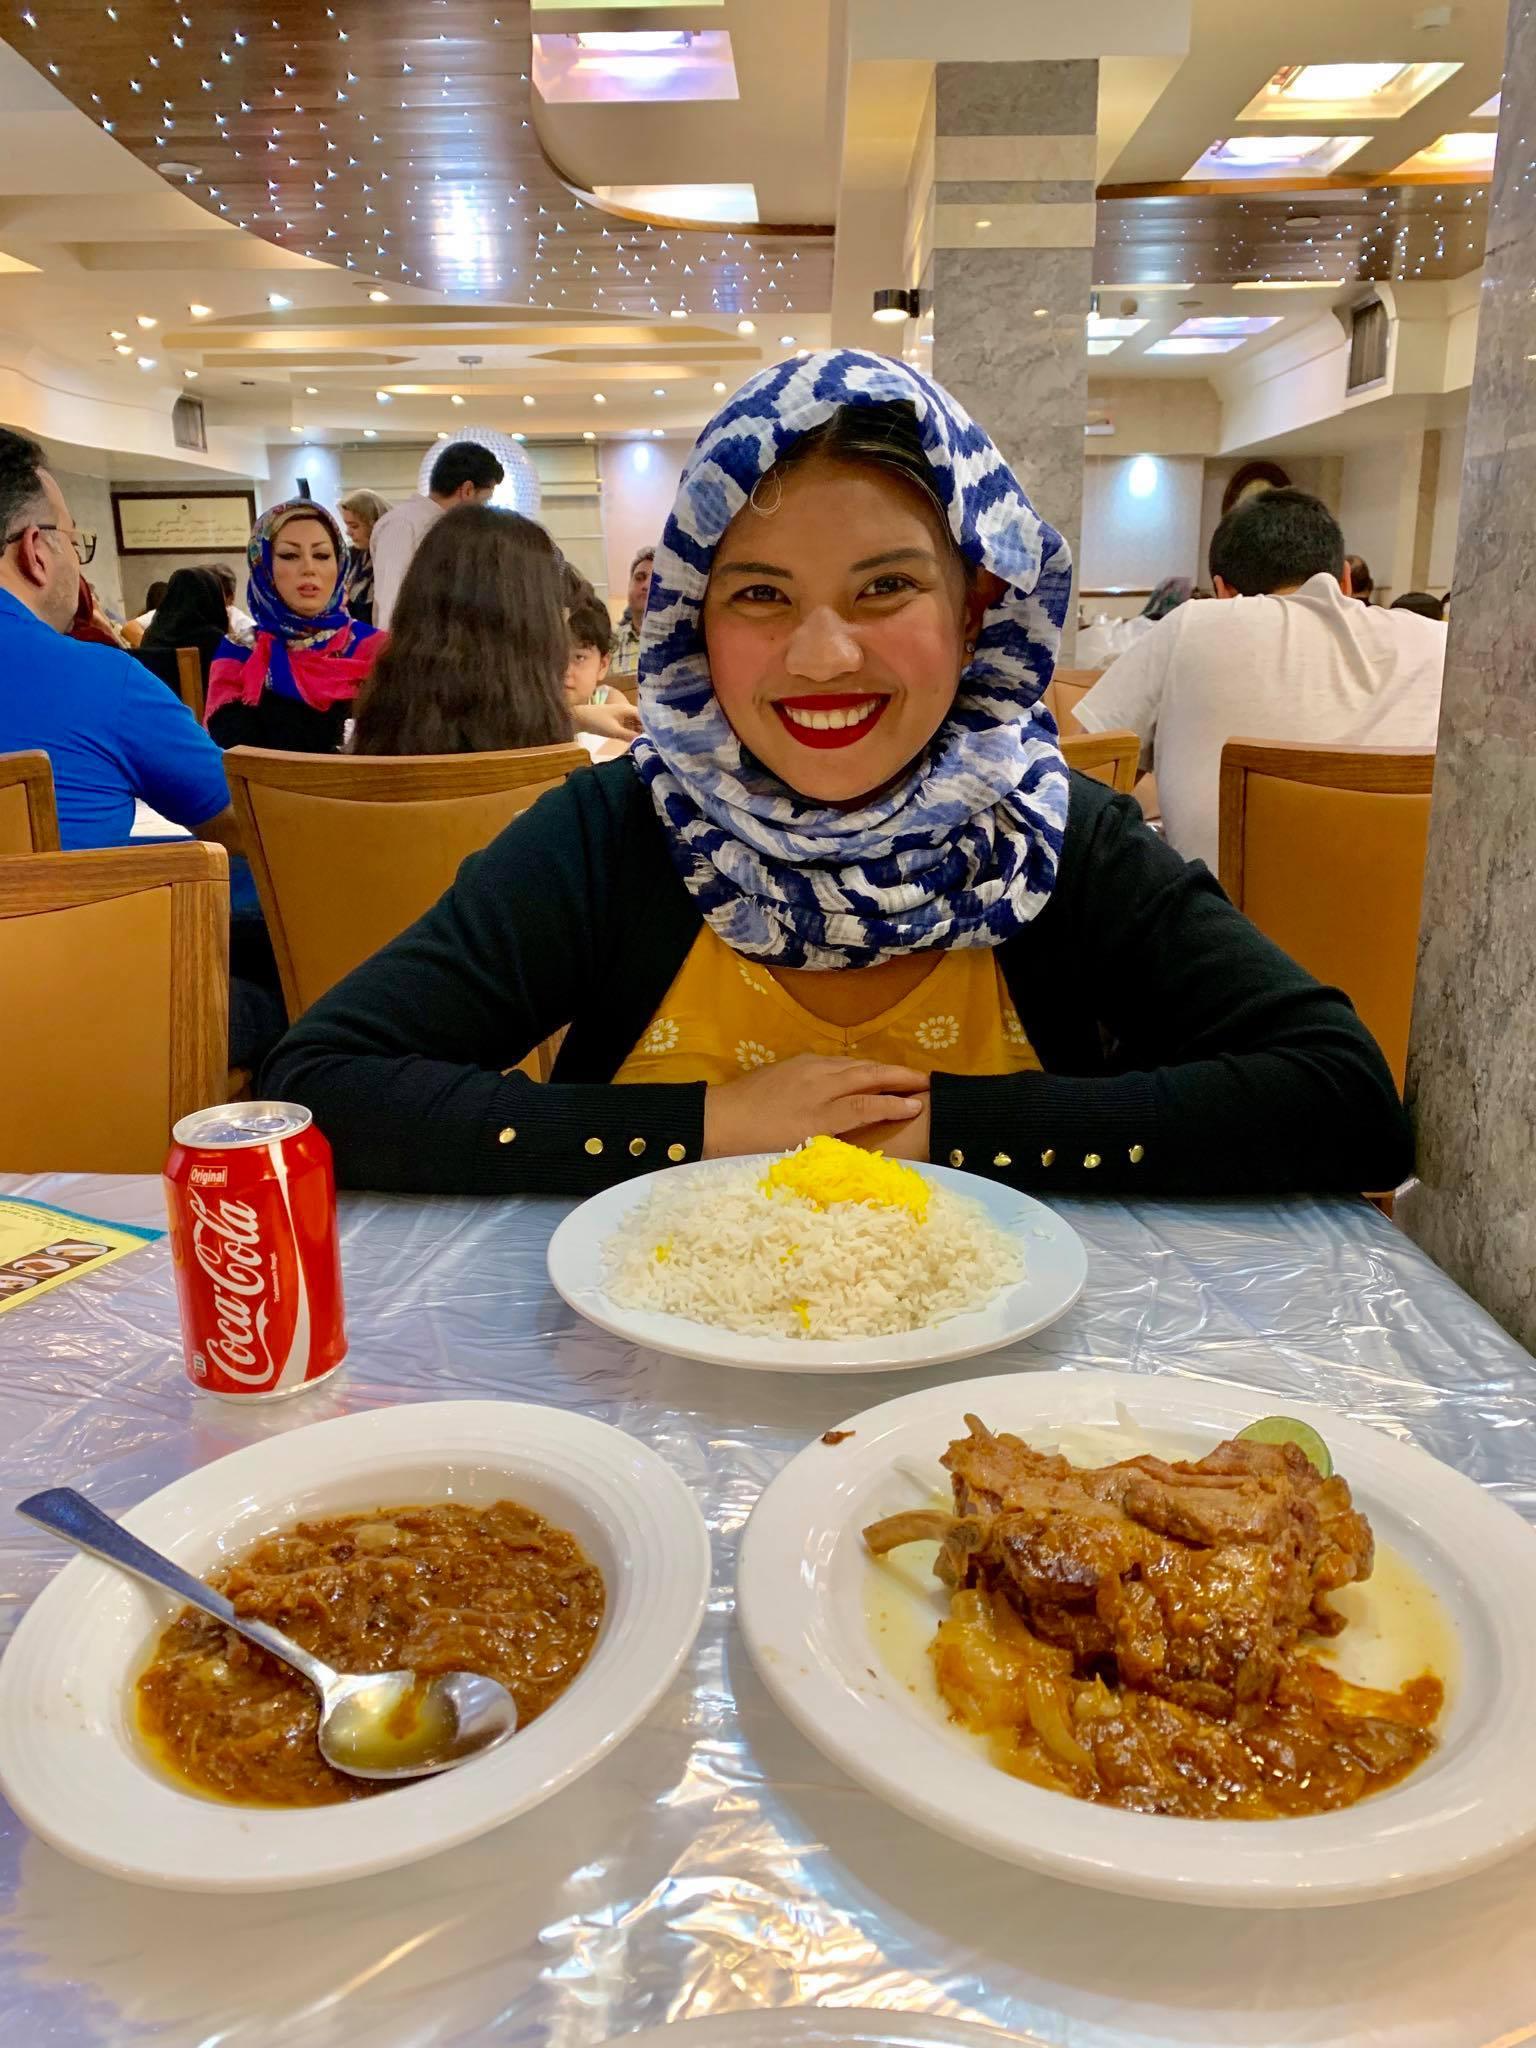 Kach Solo Travels in 2019 Mashhad to Shiraz30.jpg